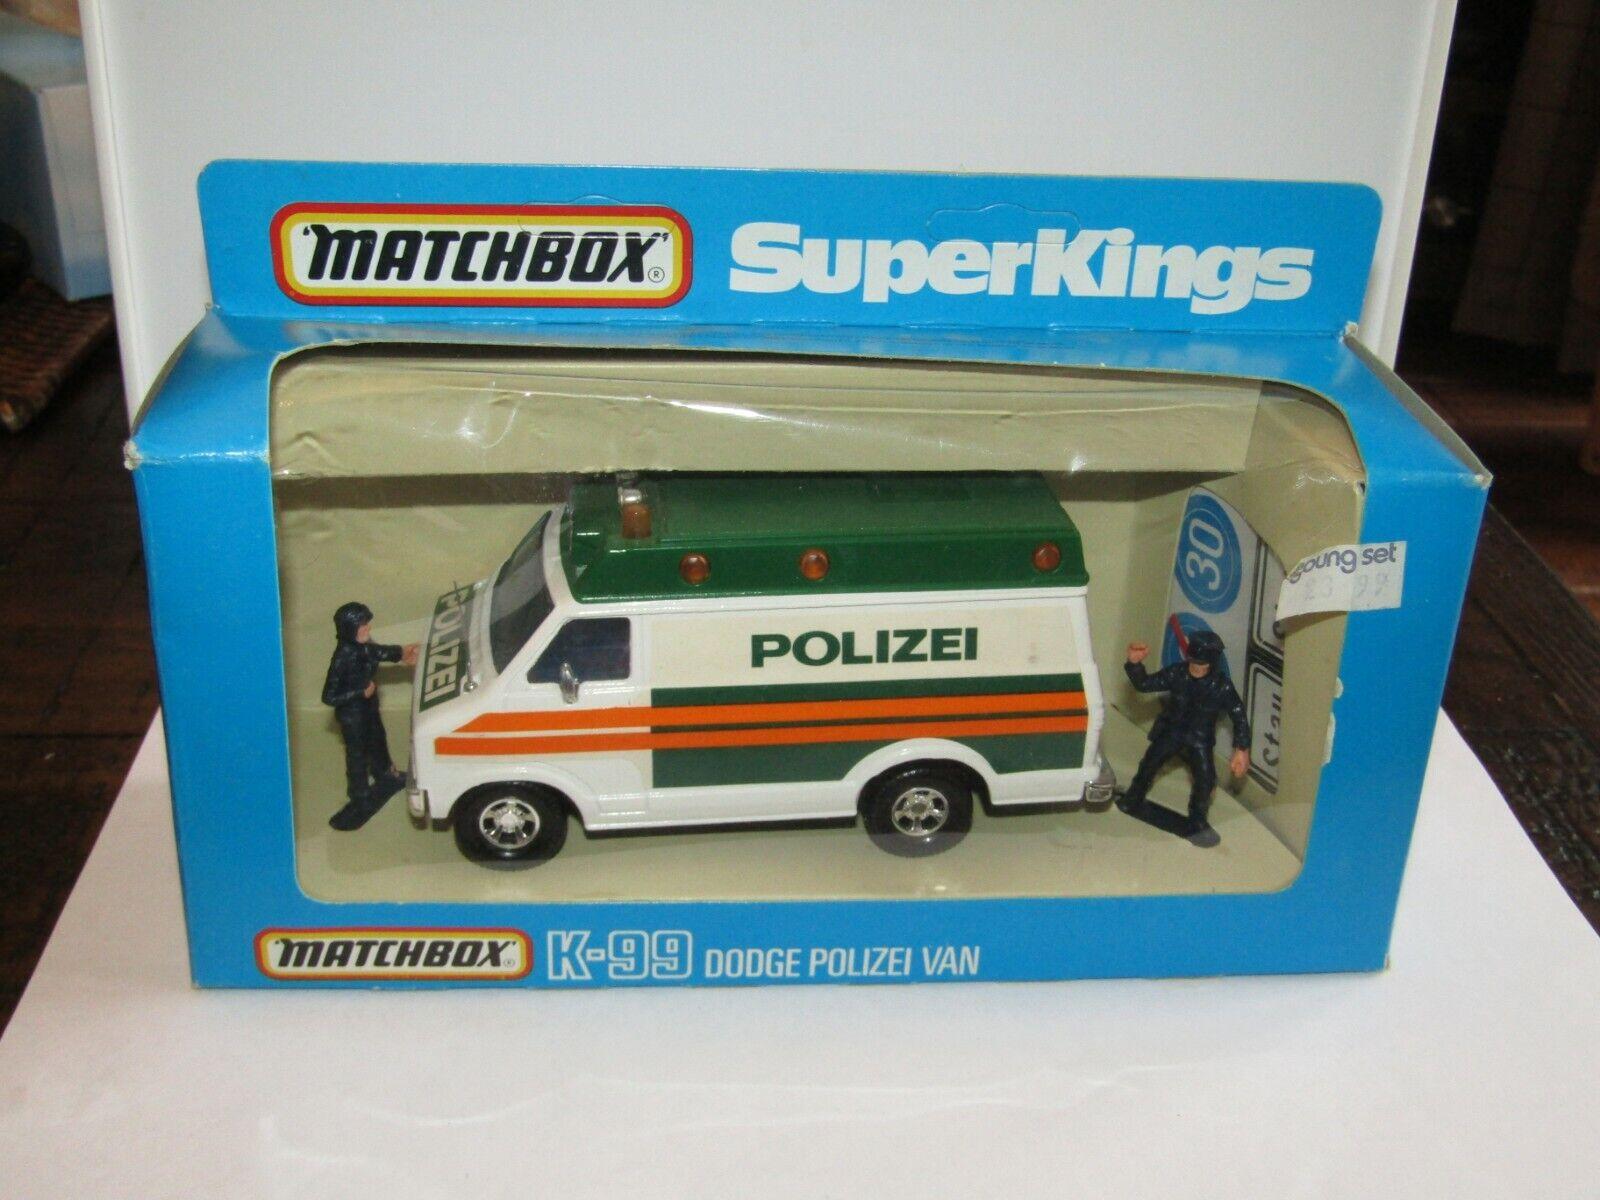 Matchbox Super Kings K-99 Dodge Polizei Van German Issue MIB